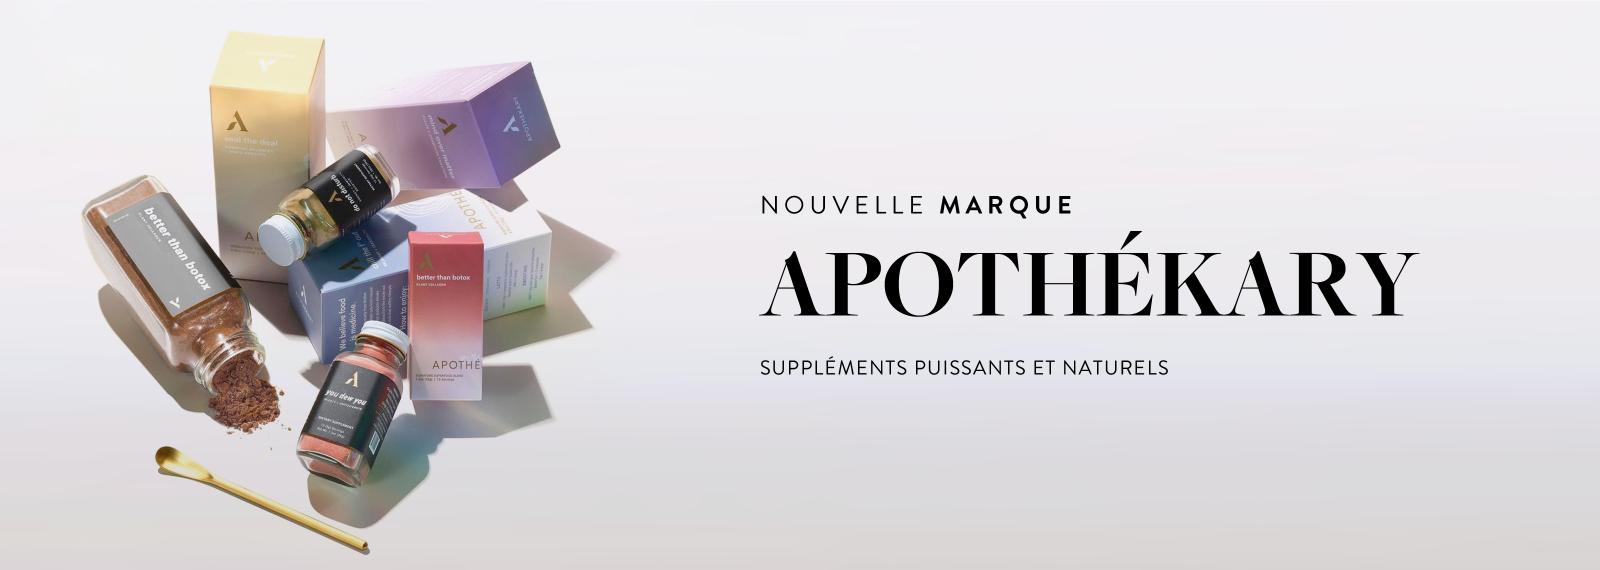 Nouvelle Marque - APOTHÉKARY